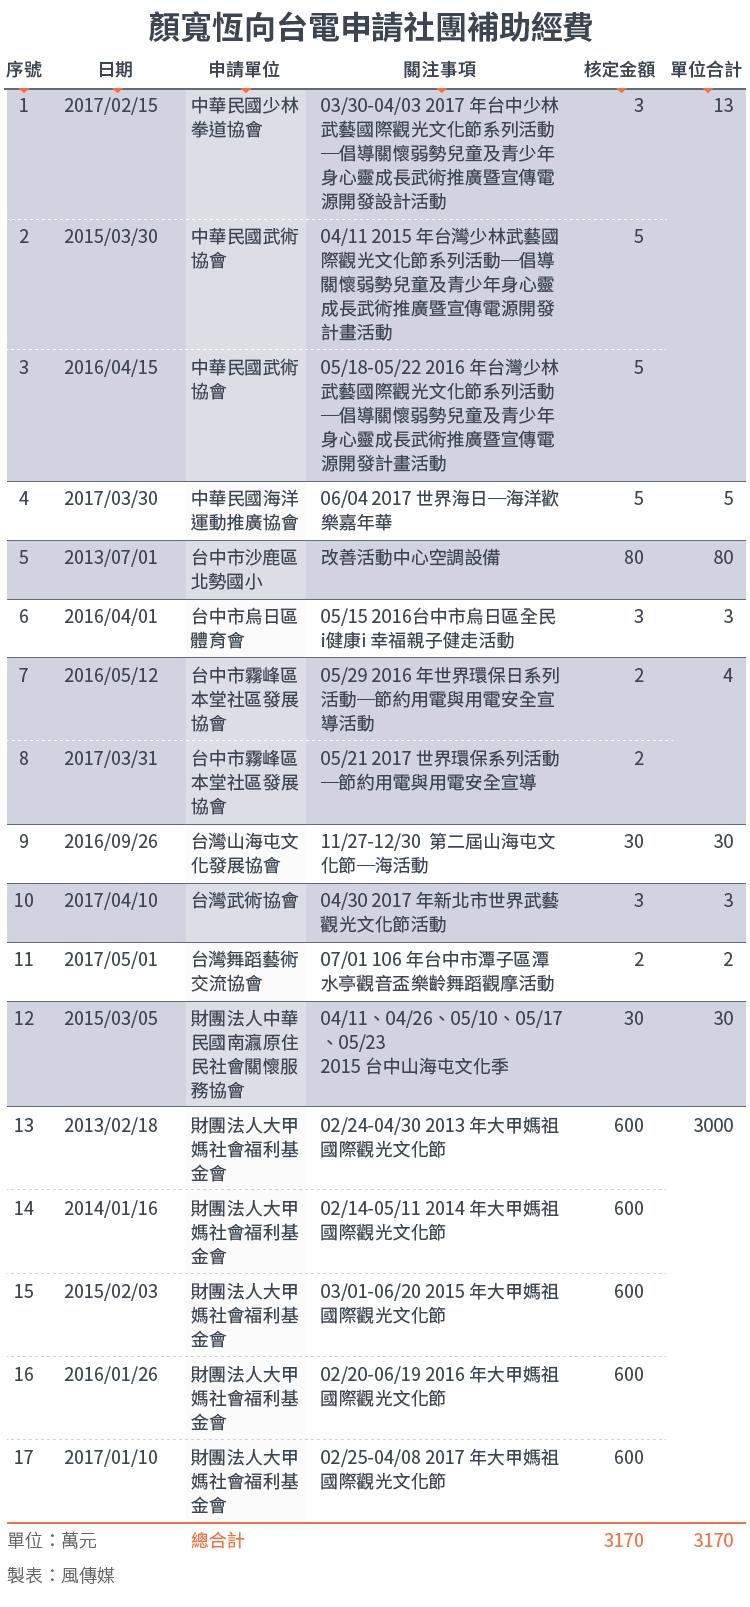 20171213-SMG0034-E01-顏寬恆向台電申請社團補助經費_工作區域 1.png